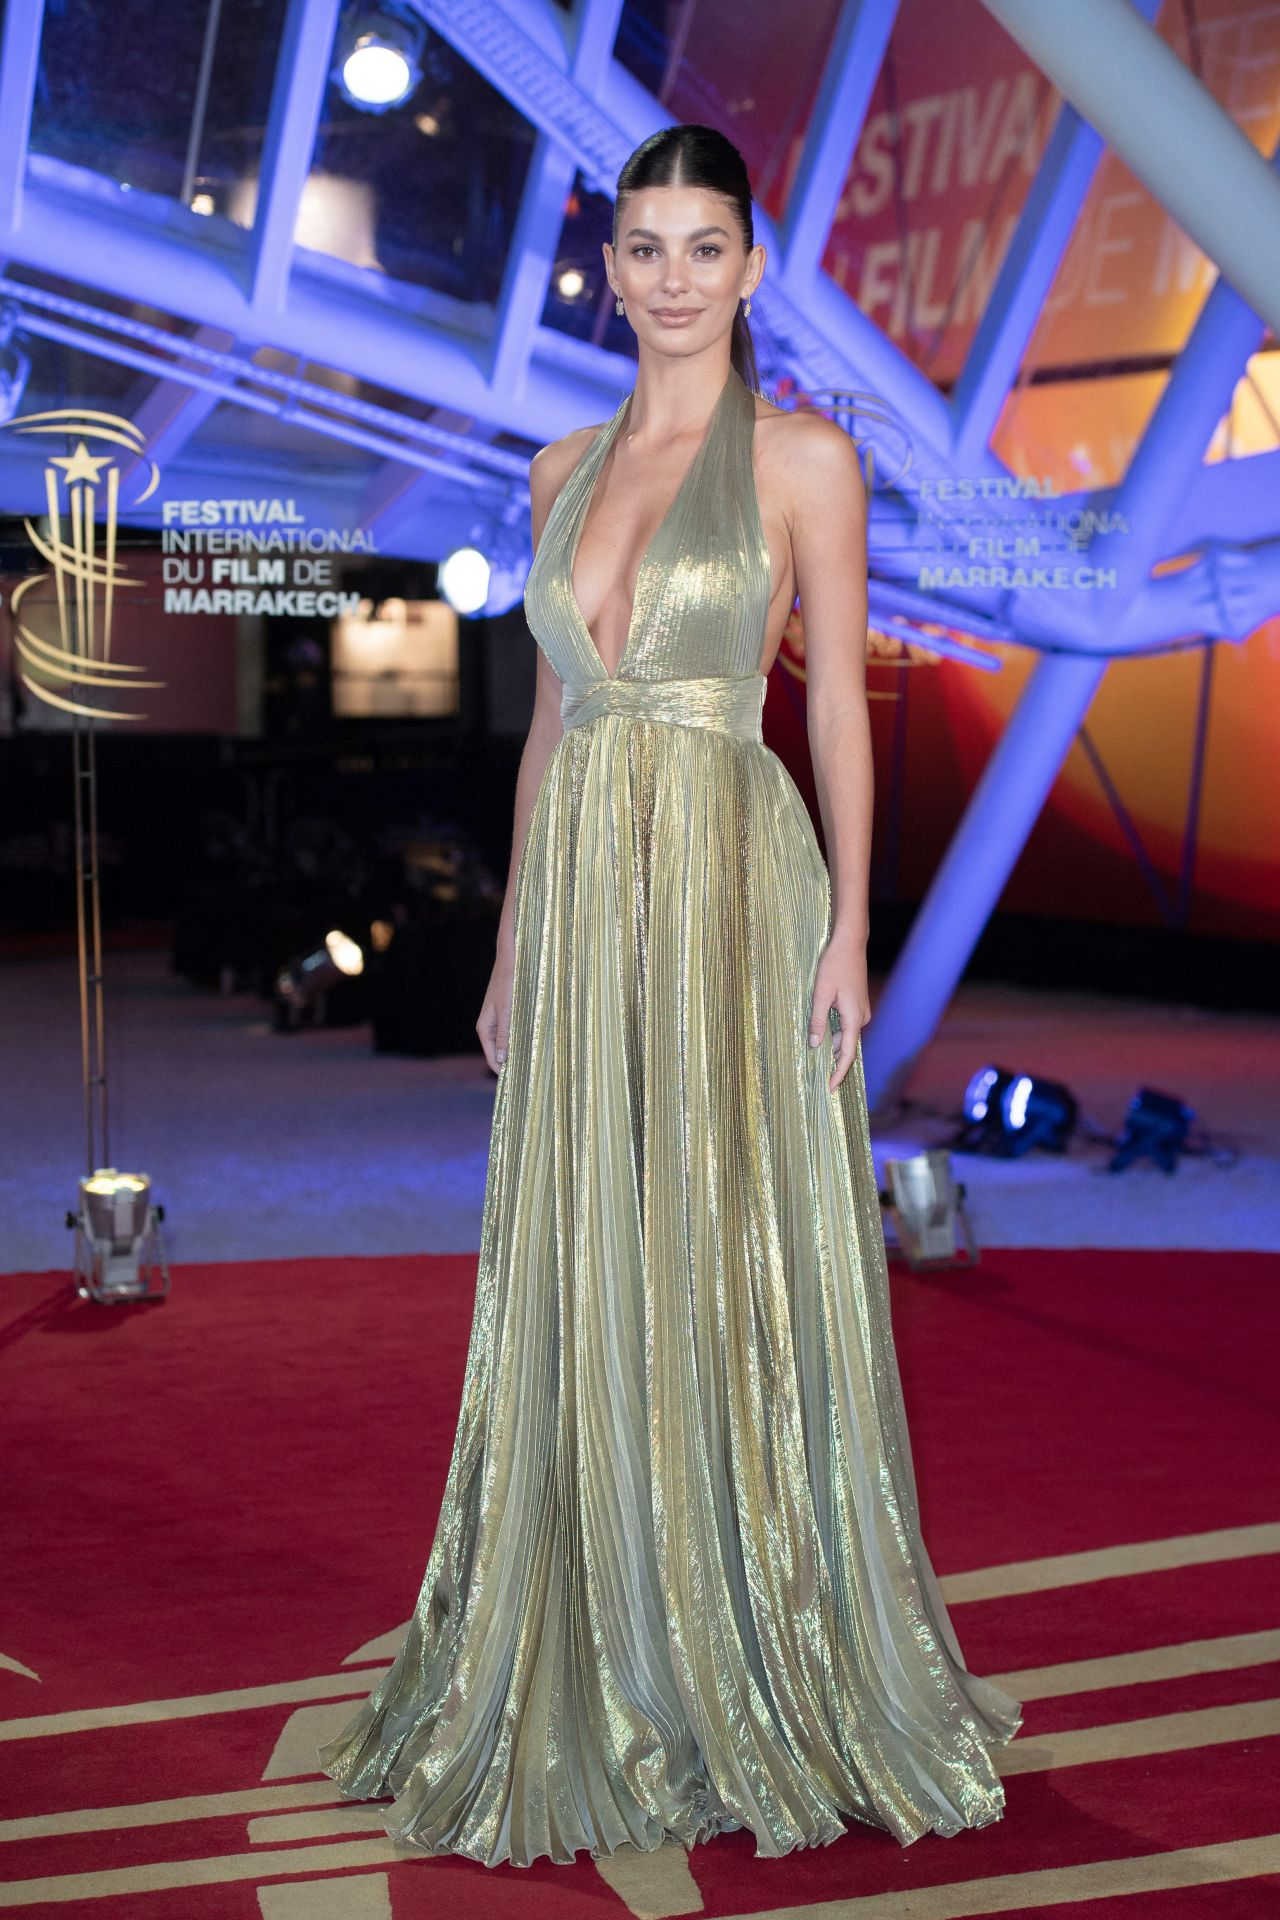 camila-morrone-in-etro-tribute-to-australian-cinema-at-marrakesh-film-festival